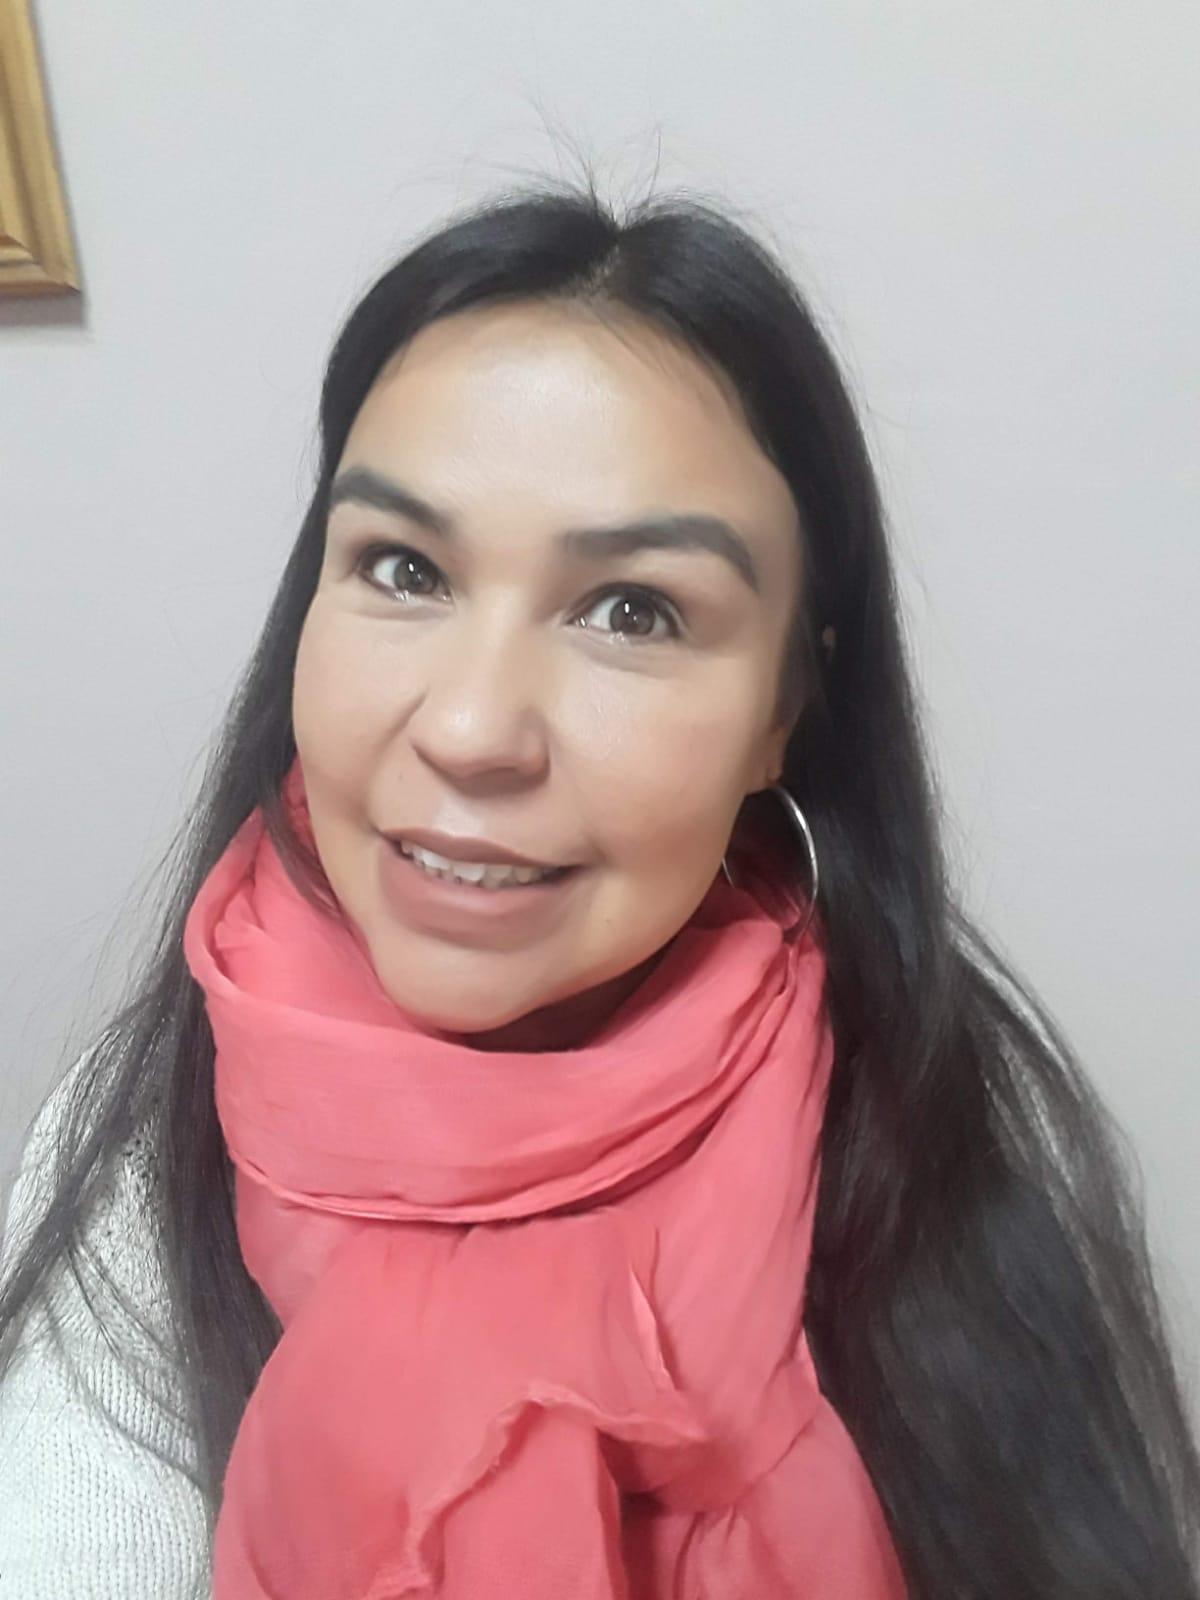 Dahiana Fernández